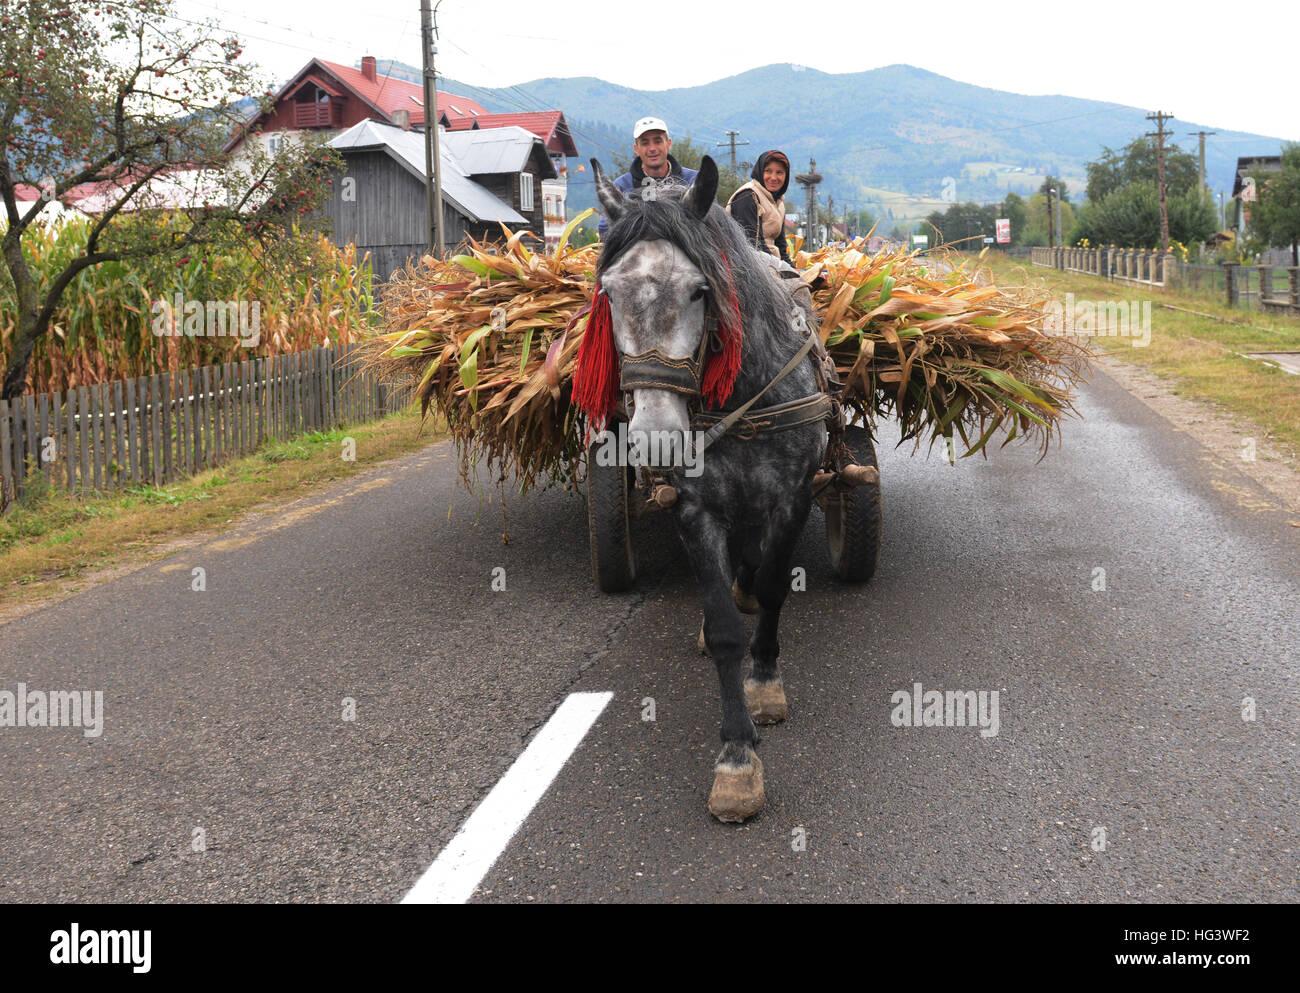 Daily scenes in the Bukovina region of northern Romania. - Stock Image